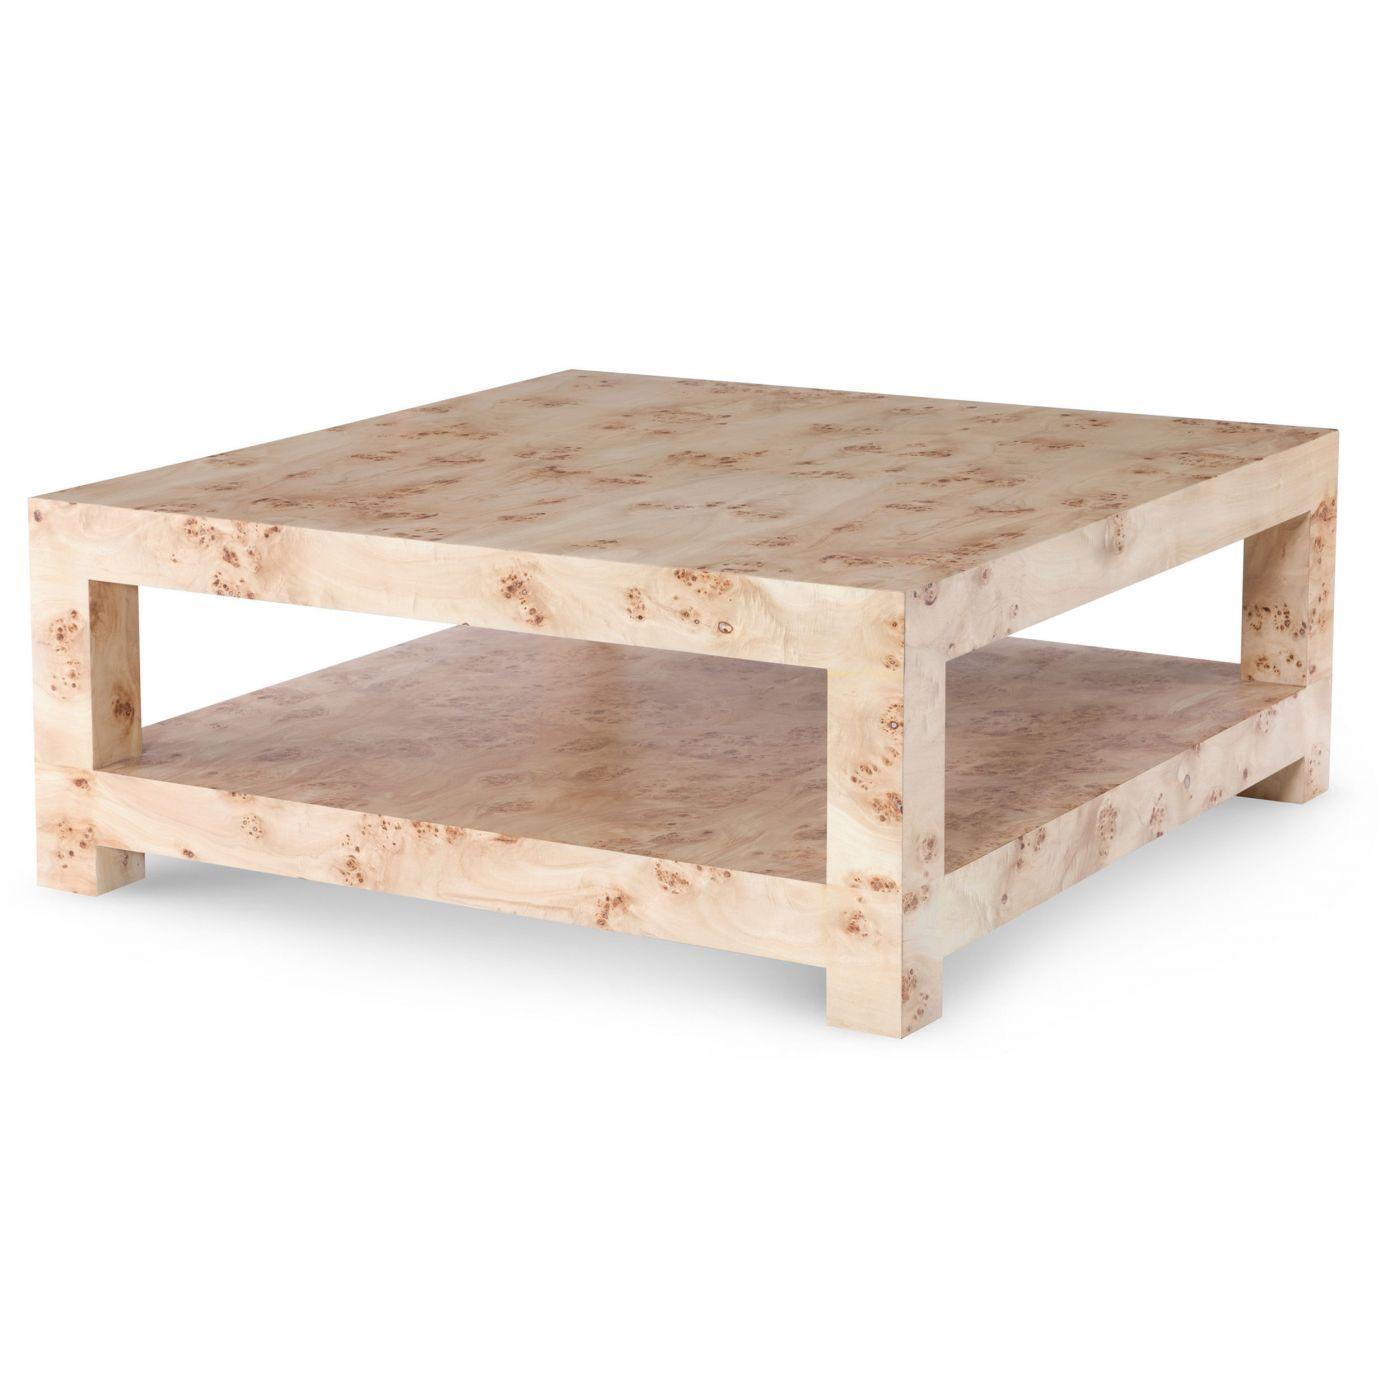 Bi Level Square Coffee Table In Mapa Burl Wood Vaneer Mapa Burl Is Actually The Burlwood Of Th Burled Wood Coffee Table Coffee Table Large Square Coffee Table